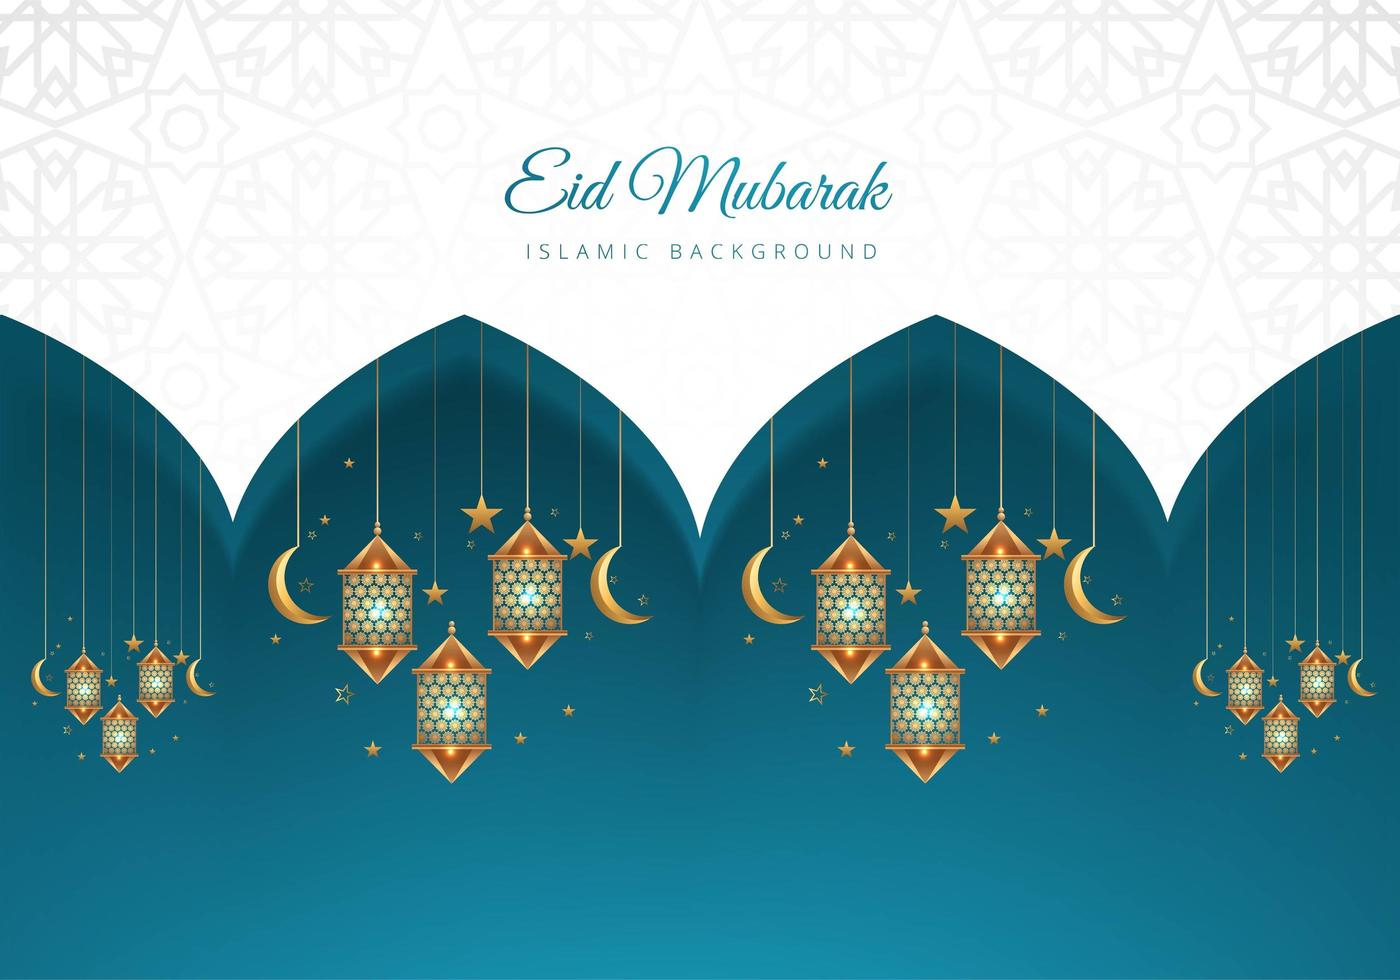 eid mubarak islamico sfondo blu e bianco lanterne vettore